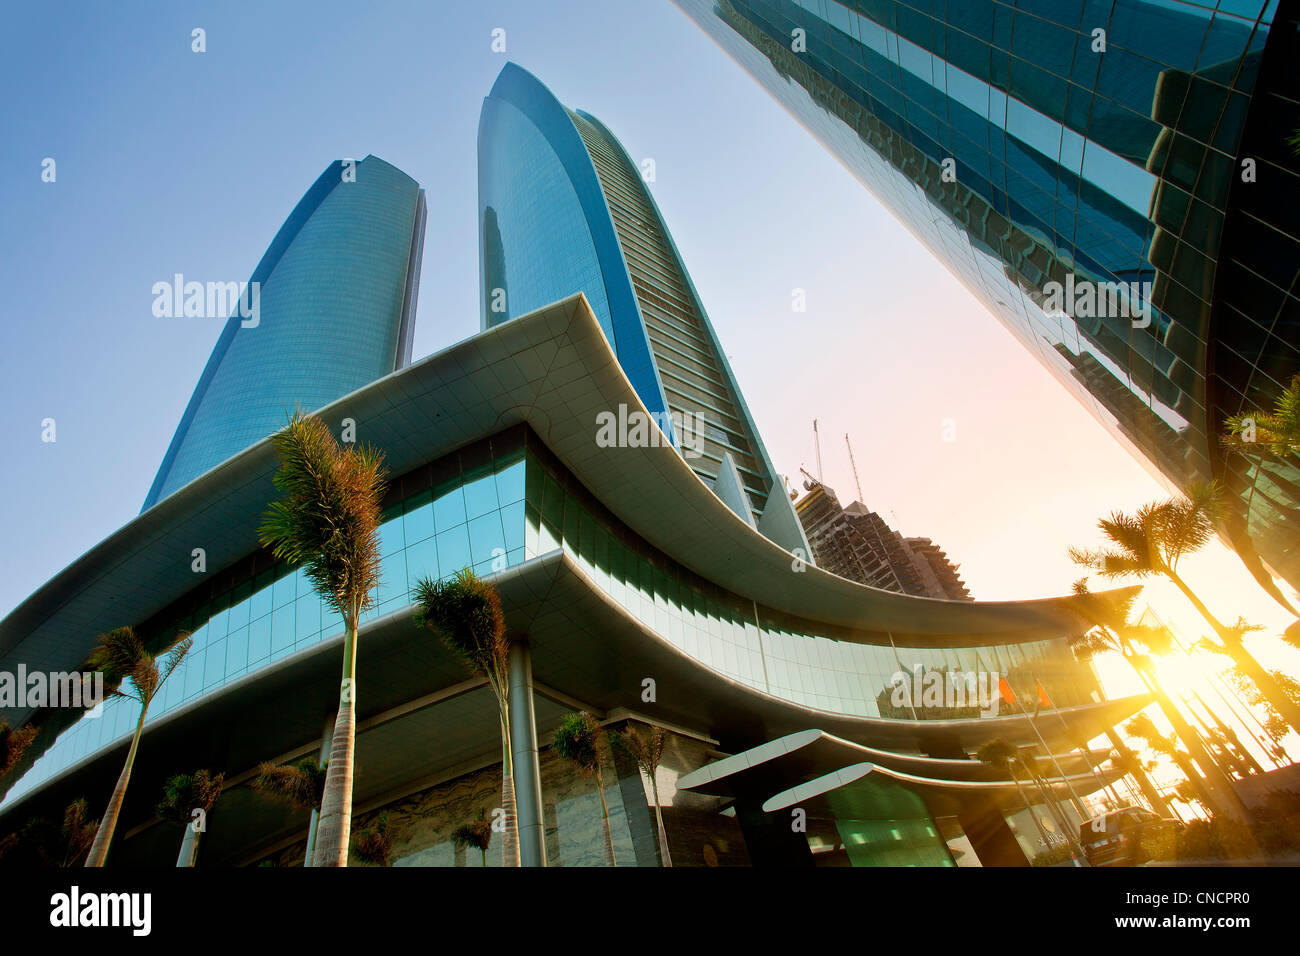 United Arab Emirates, Abu Dhabi Emirate, Abu Dhabi, Jumeirah Etihad Towers - Stock Image